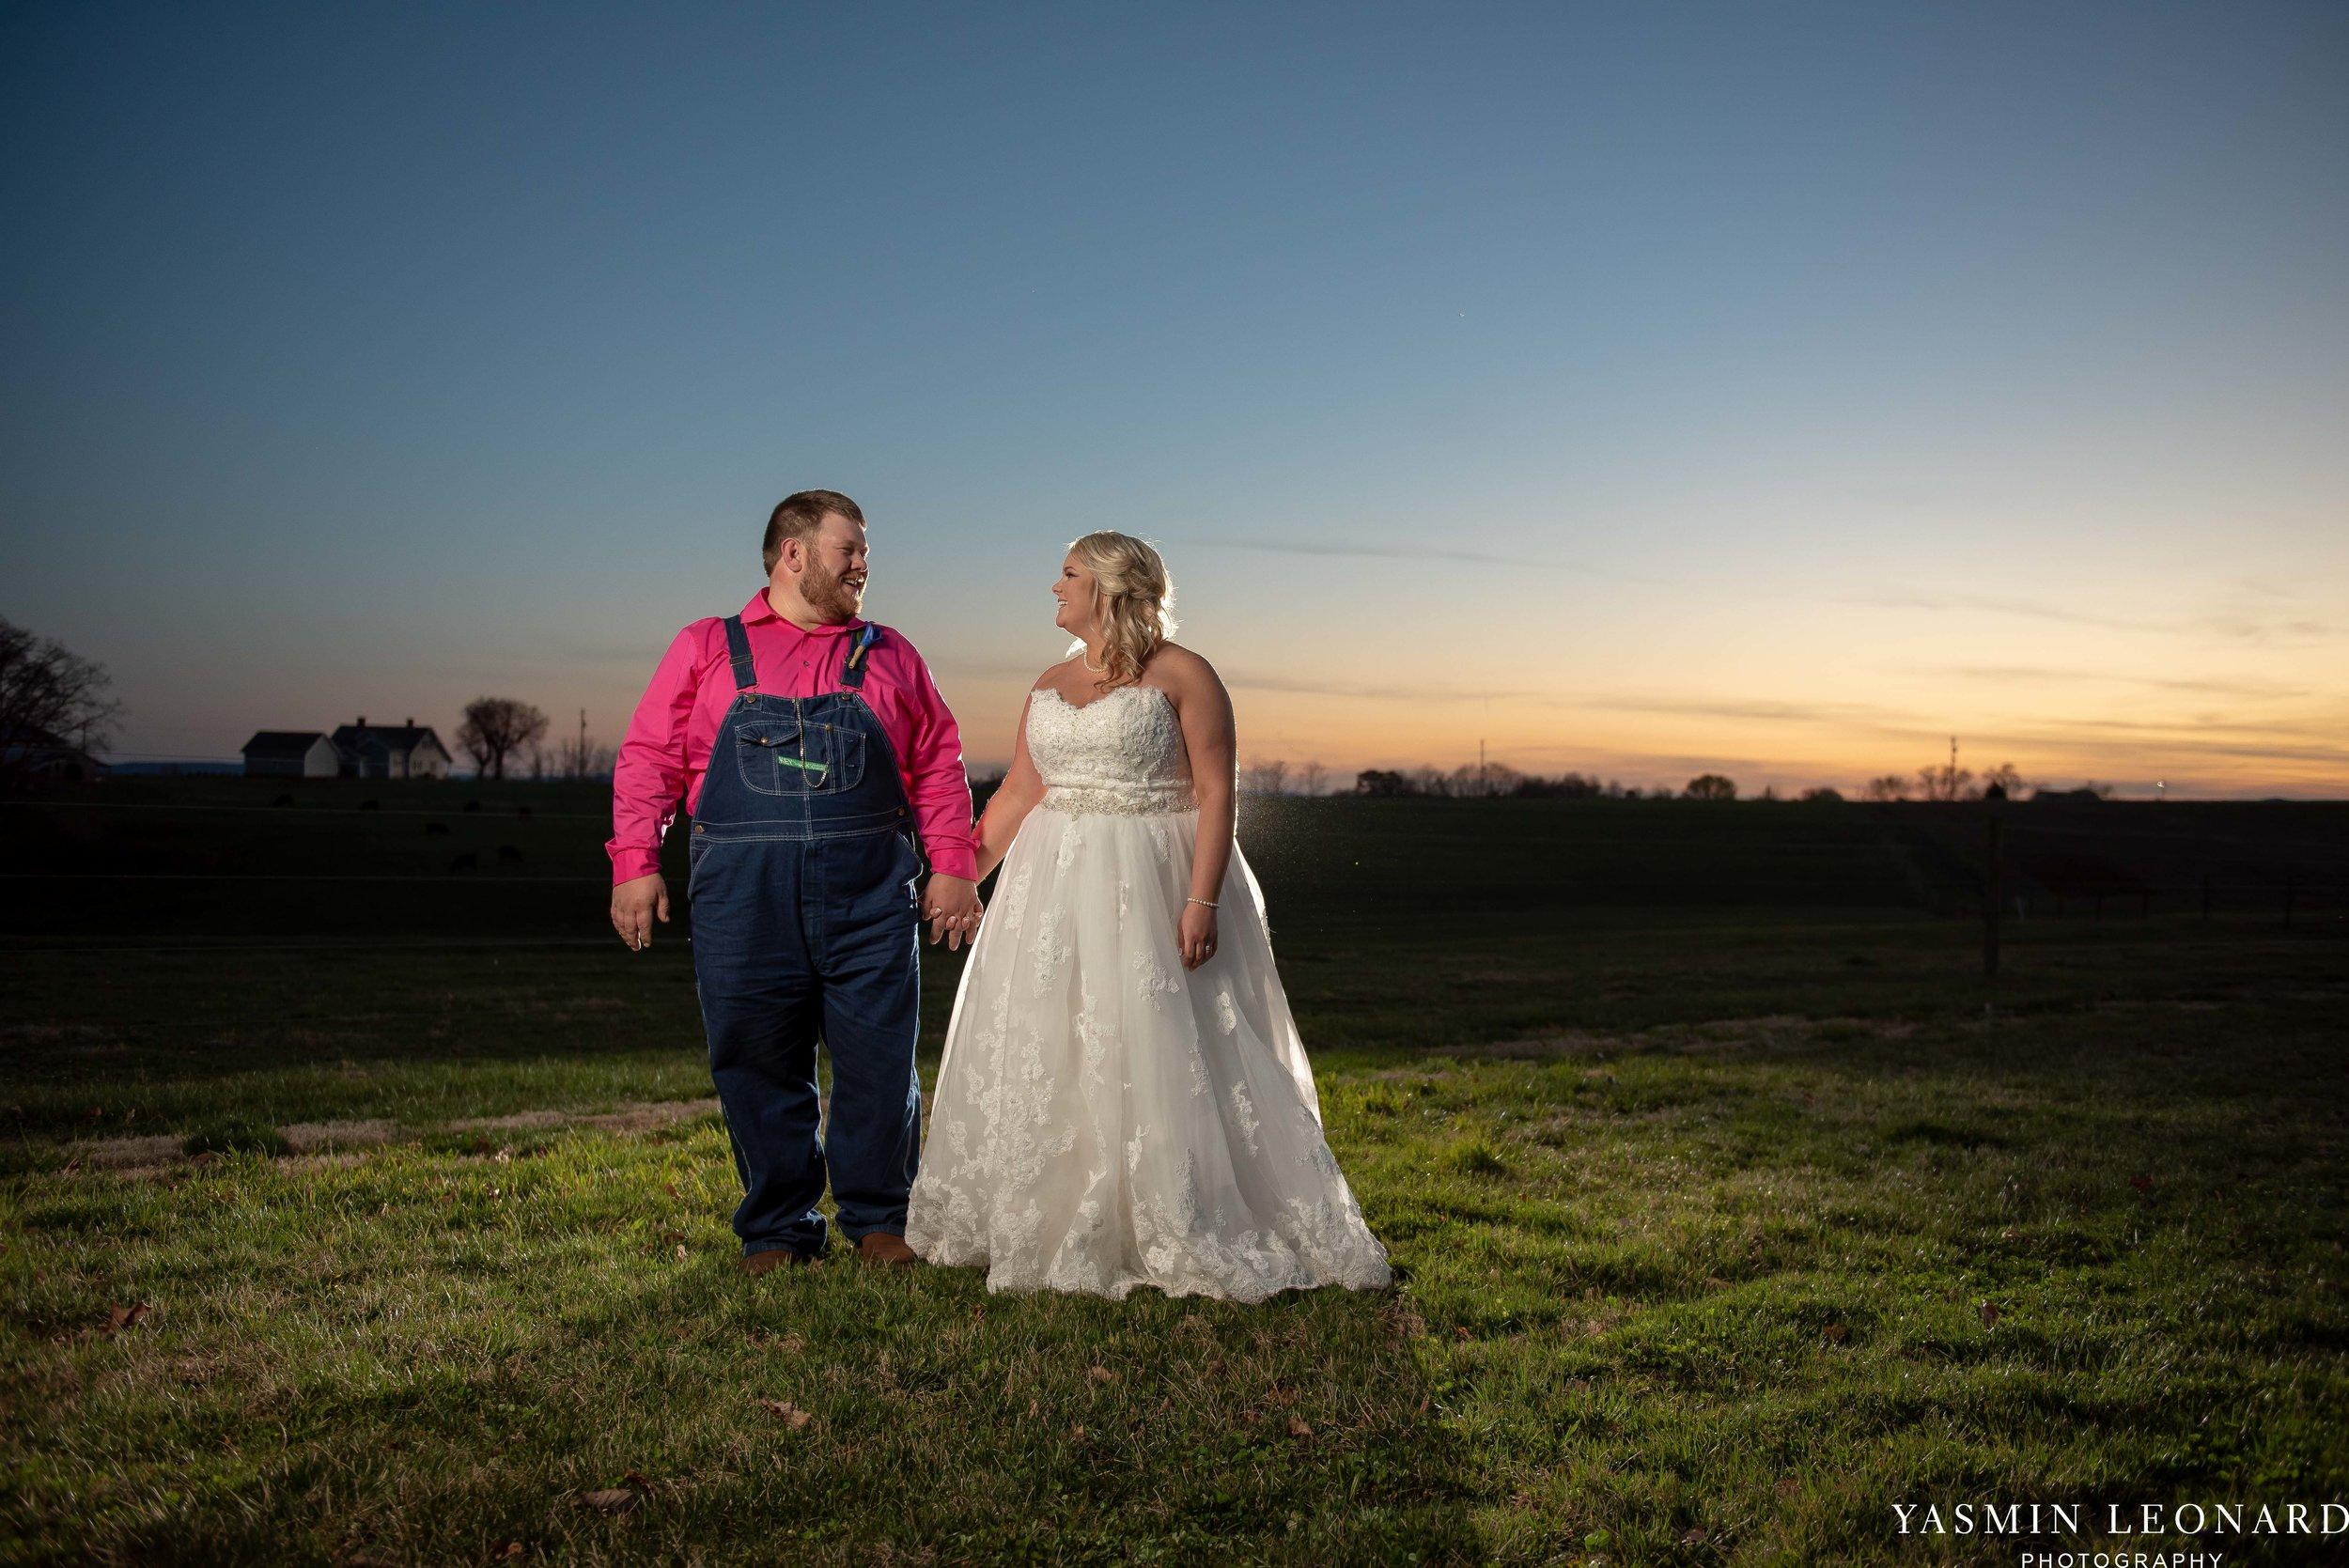 The Barn at Heritage Farm - Country Wedding - Pink and Blue Wedding - Barn Wedding - Outdoor Wedding - Cotton and Wheat Decor - Groom in Bibs - Pink Bridal Colors - Yasmin Leonard Photography-31.jpg